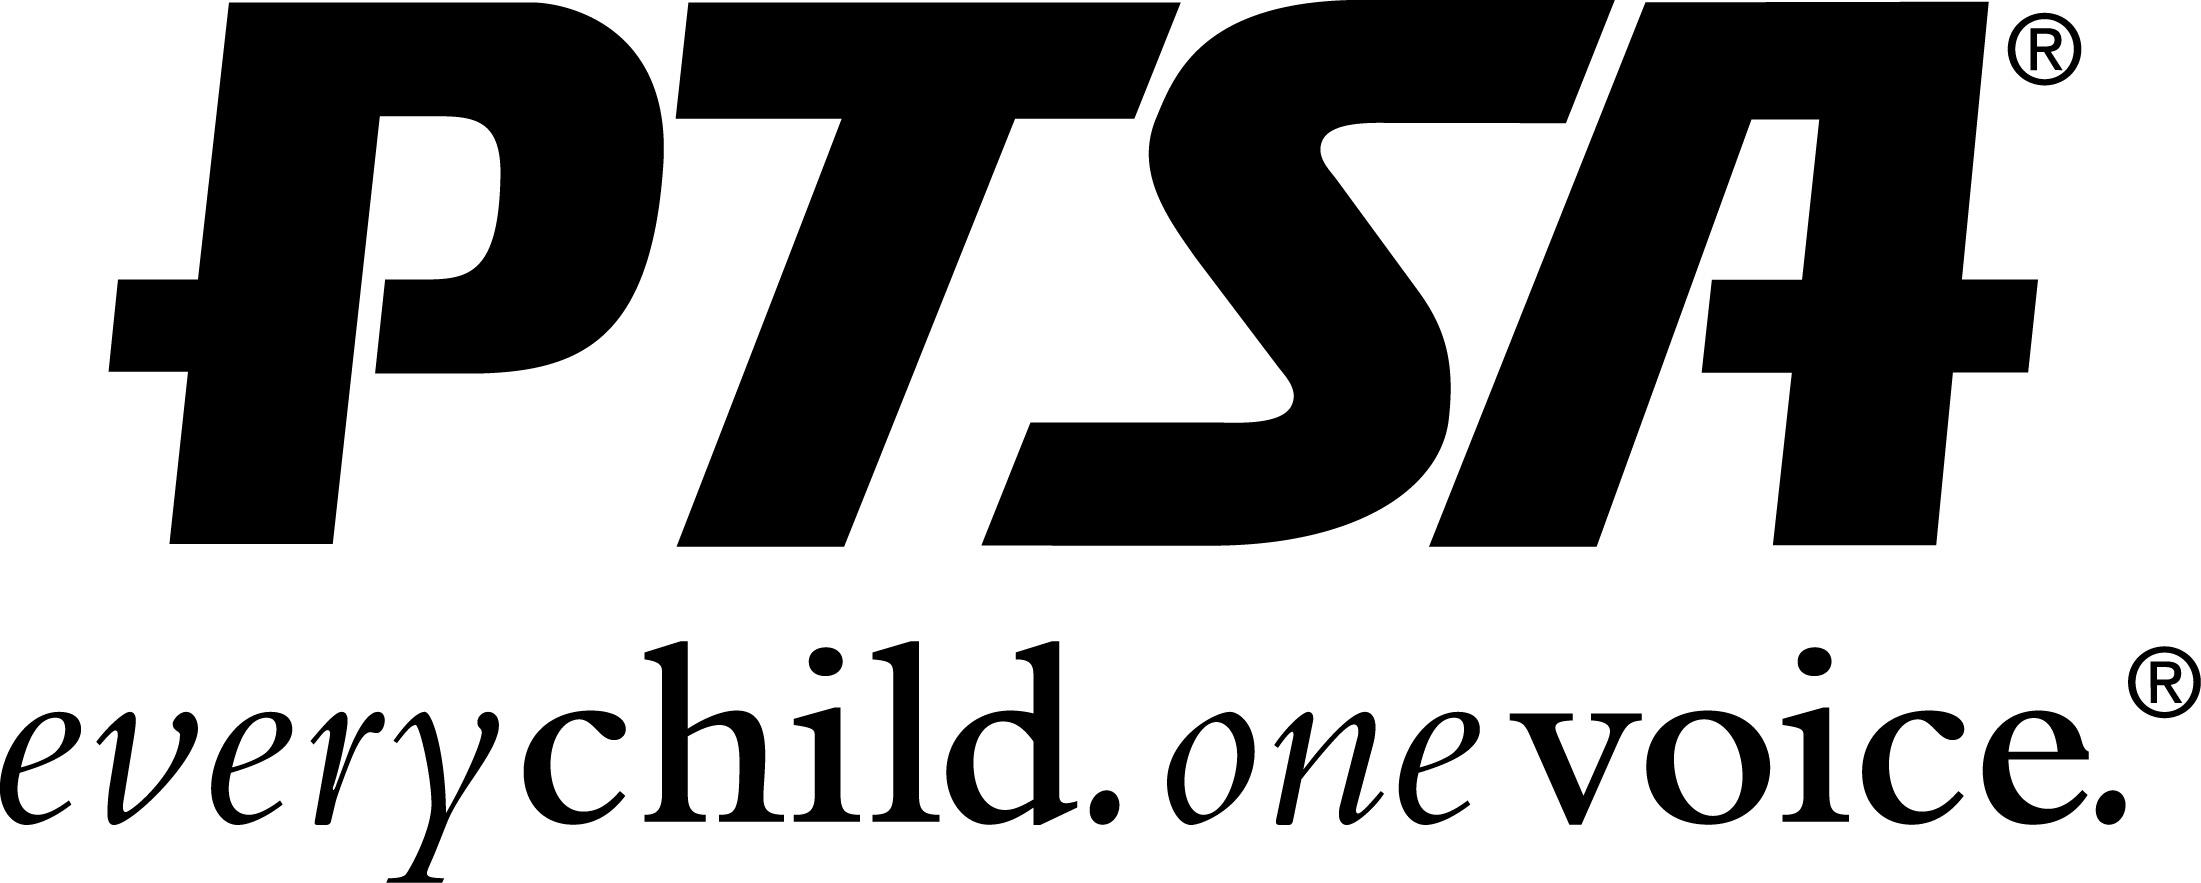 PTSA logo - everychild, one voice